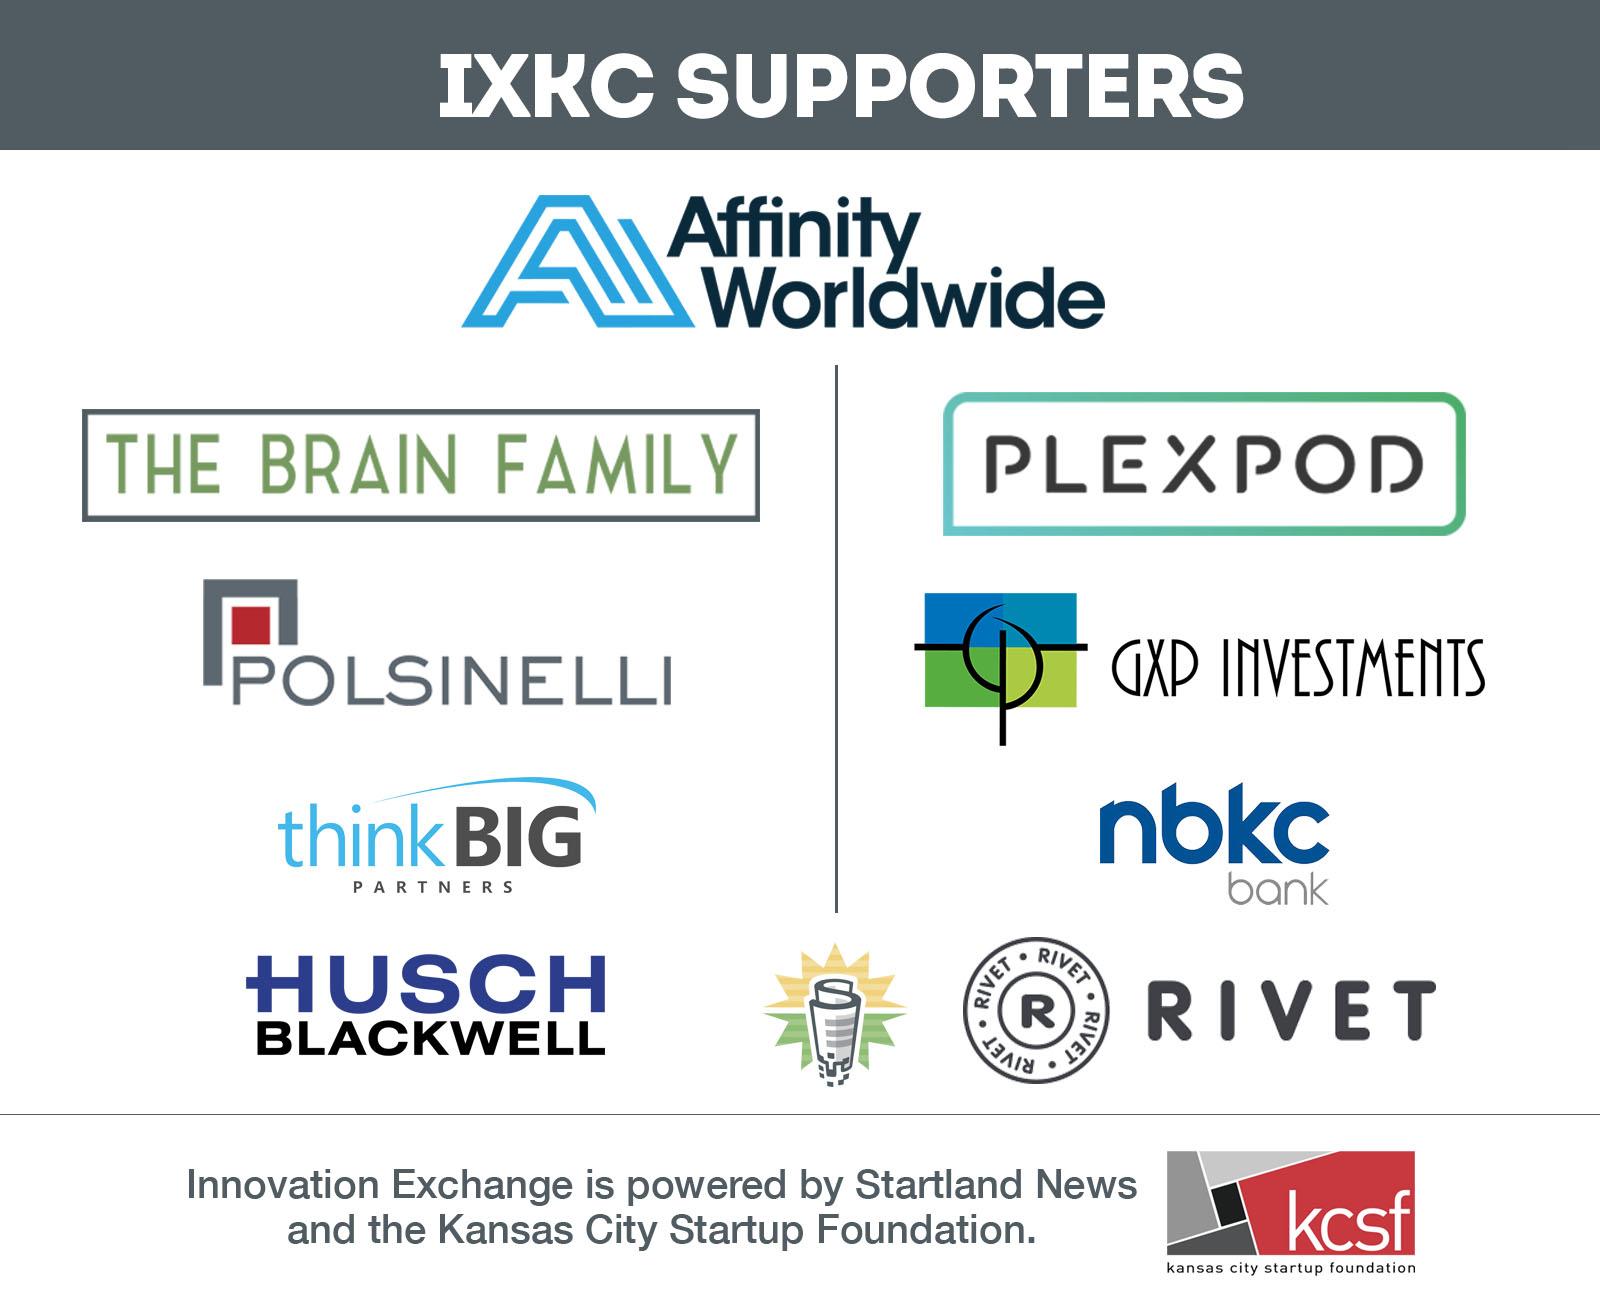 IXKC Sponsors